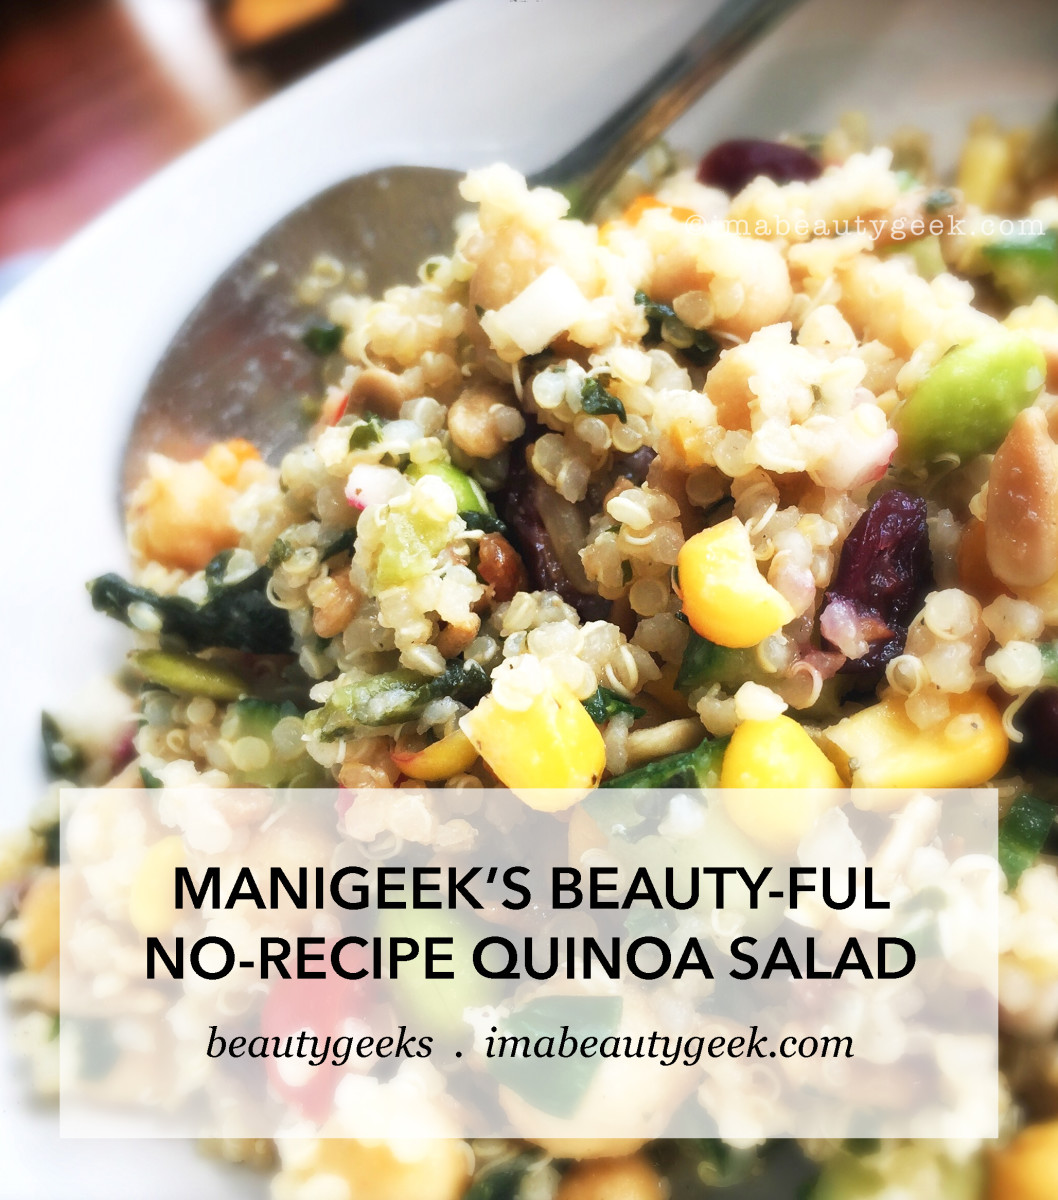 Manigeek's no-recipe Quinoa Salad